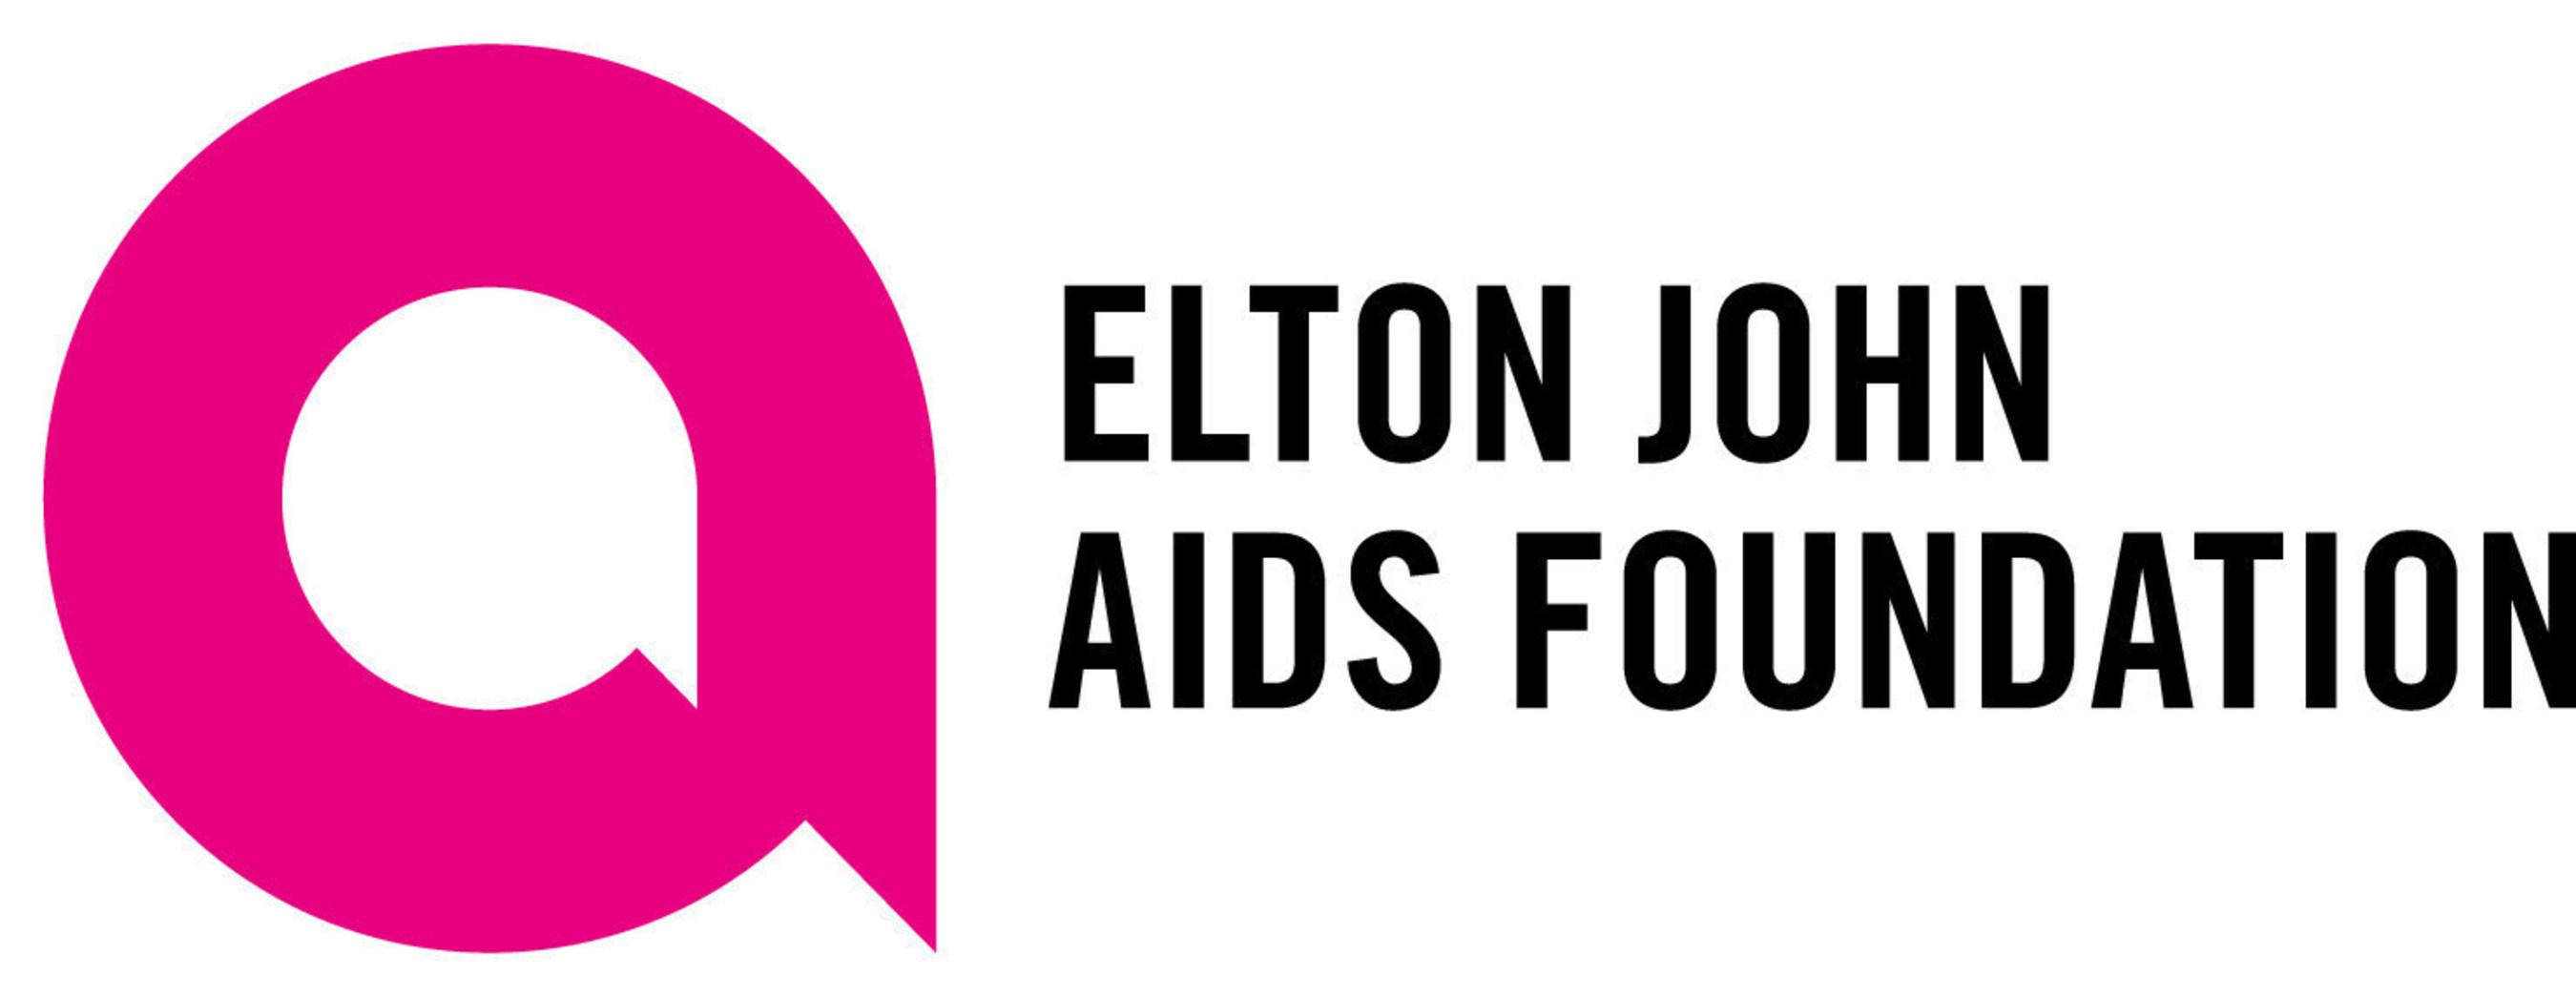 Elton John AIDS Foundation Logo